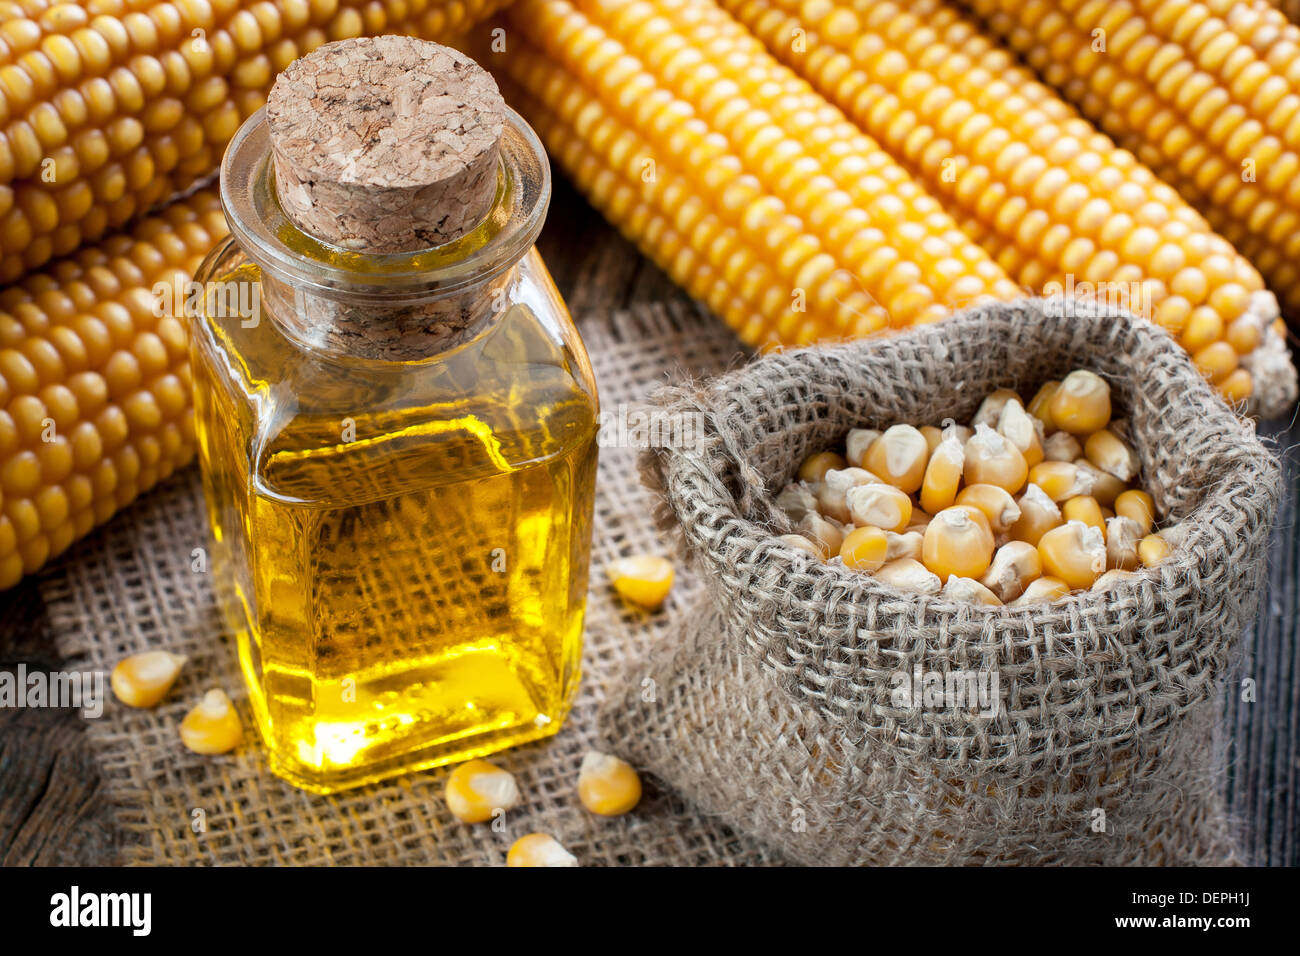 Corn oil in small bottle - Stock Image